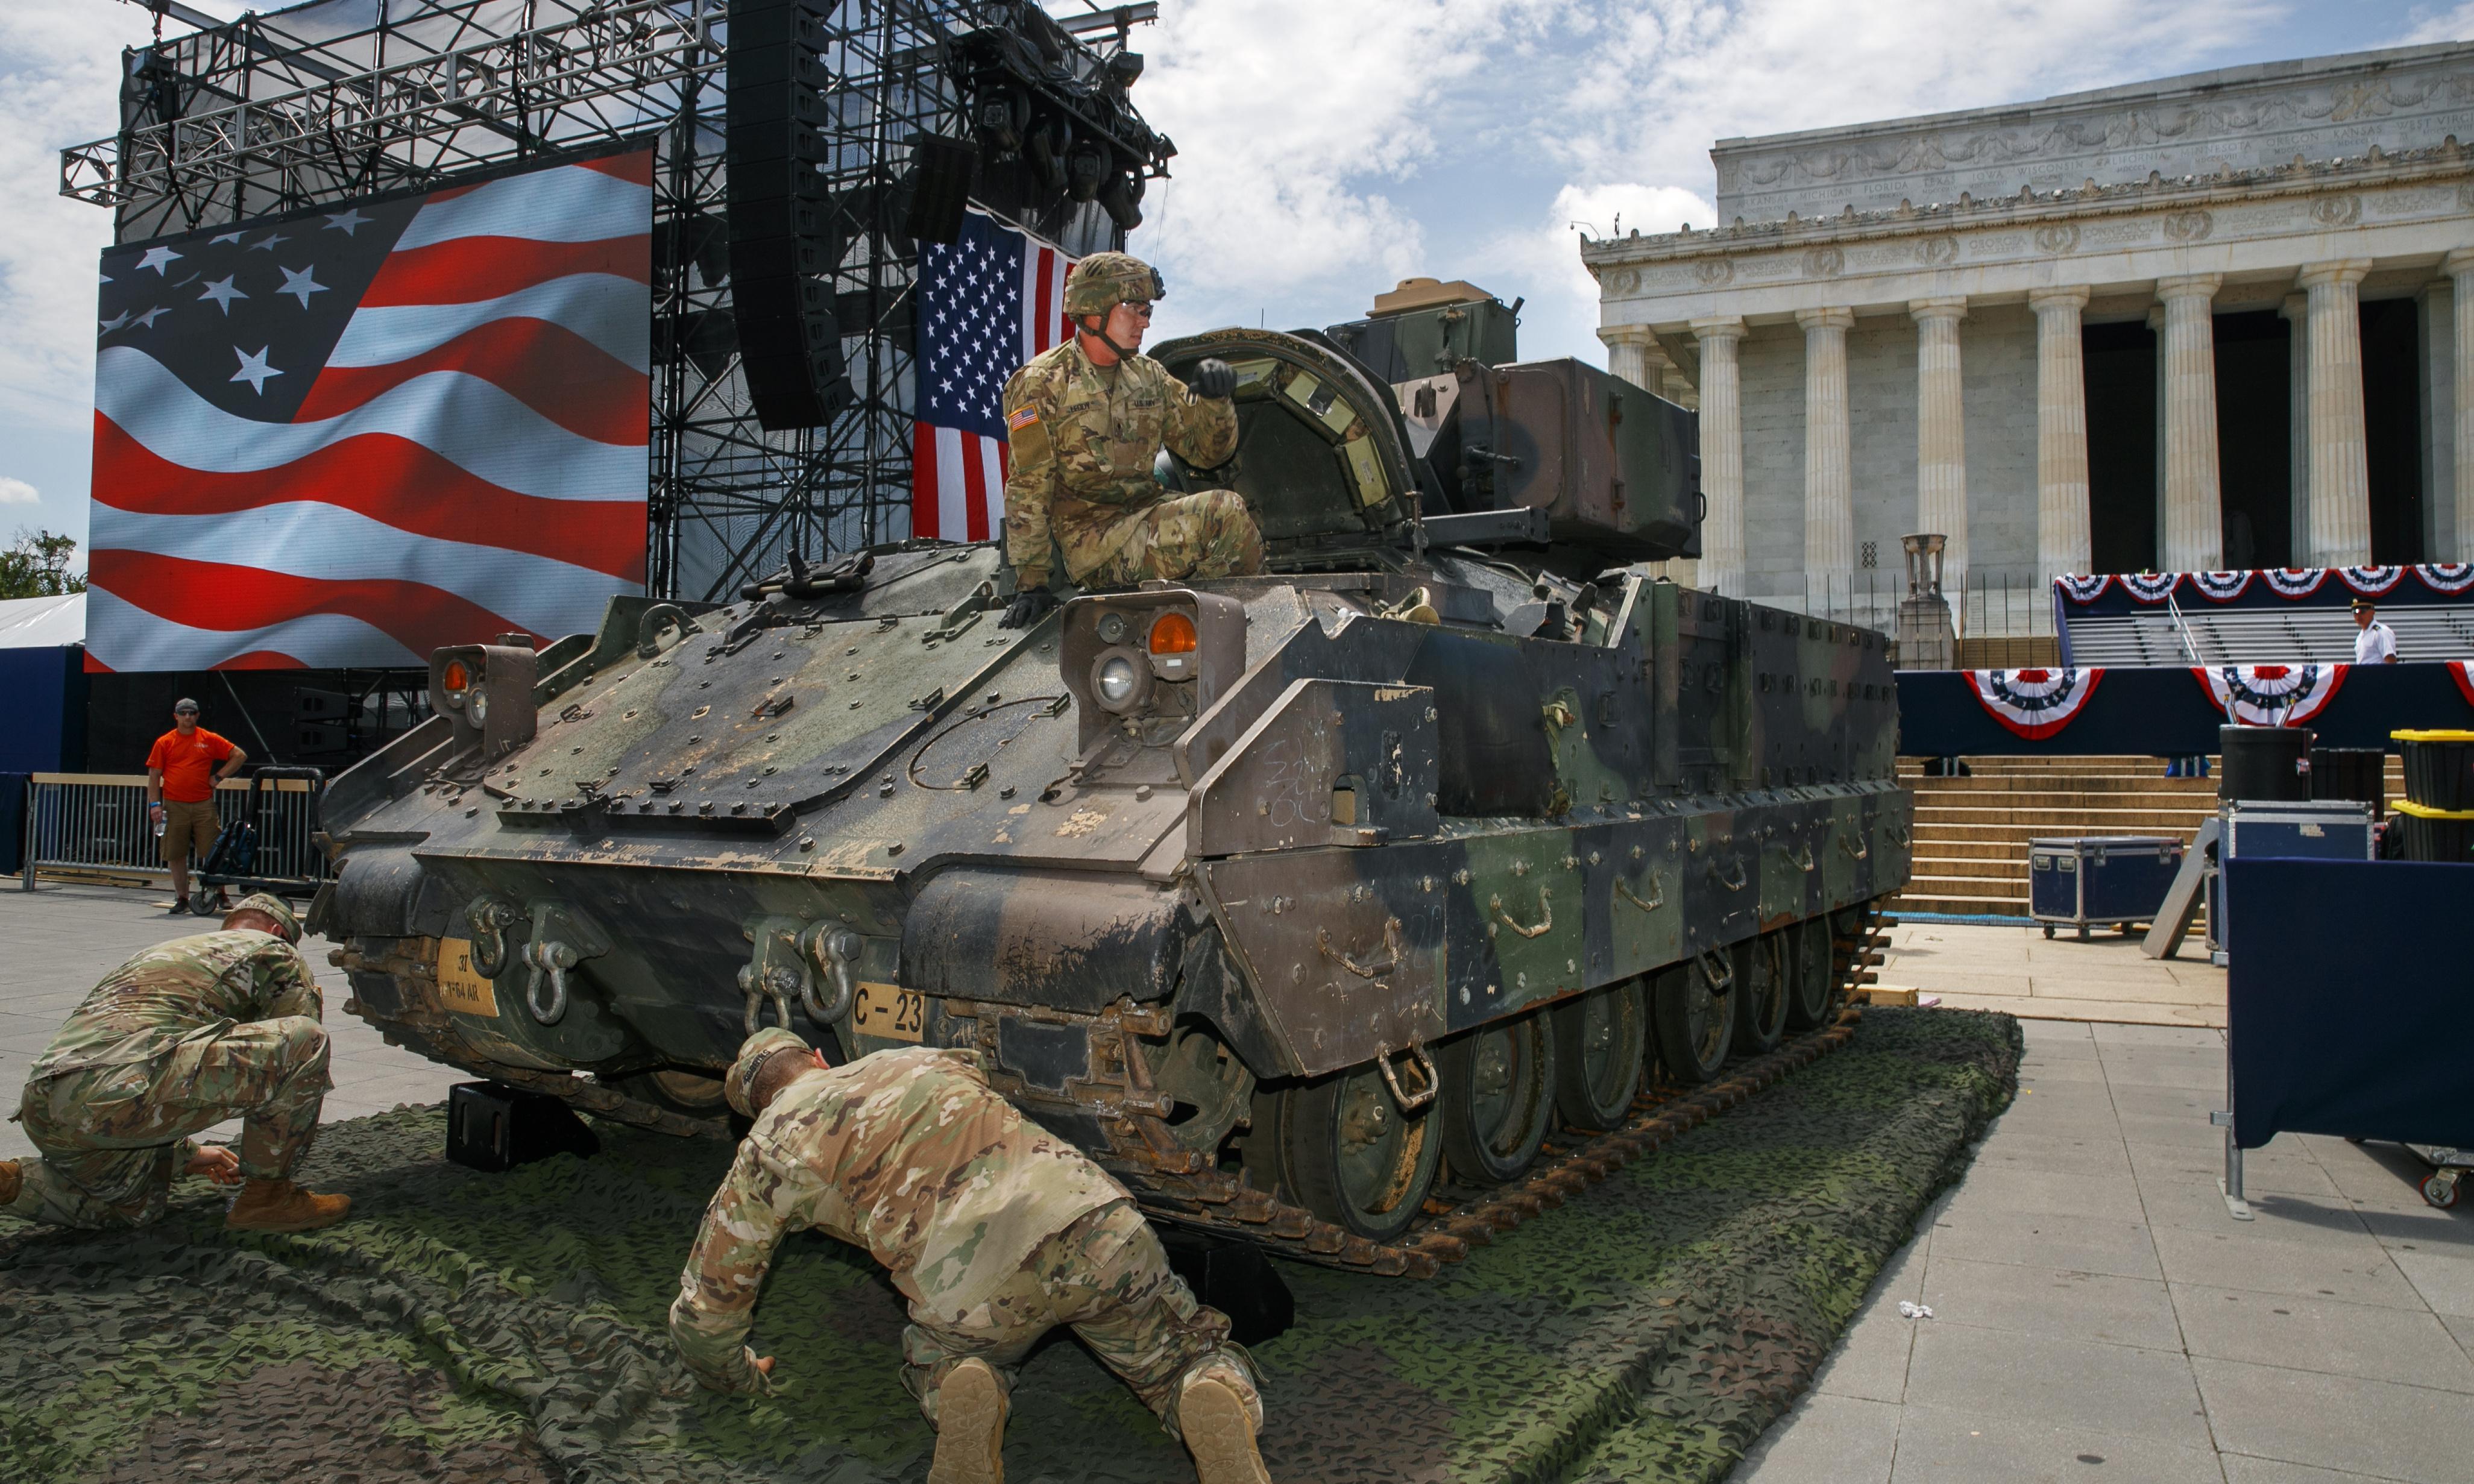 'A narcissistic travesty': critics savage Trump's Independence Day jamboree